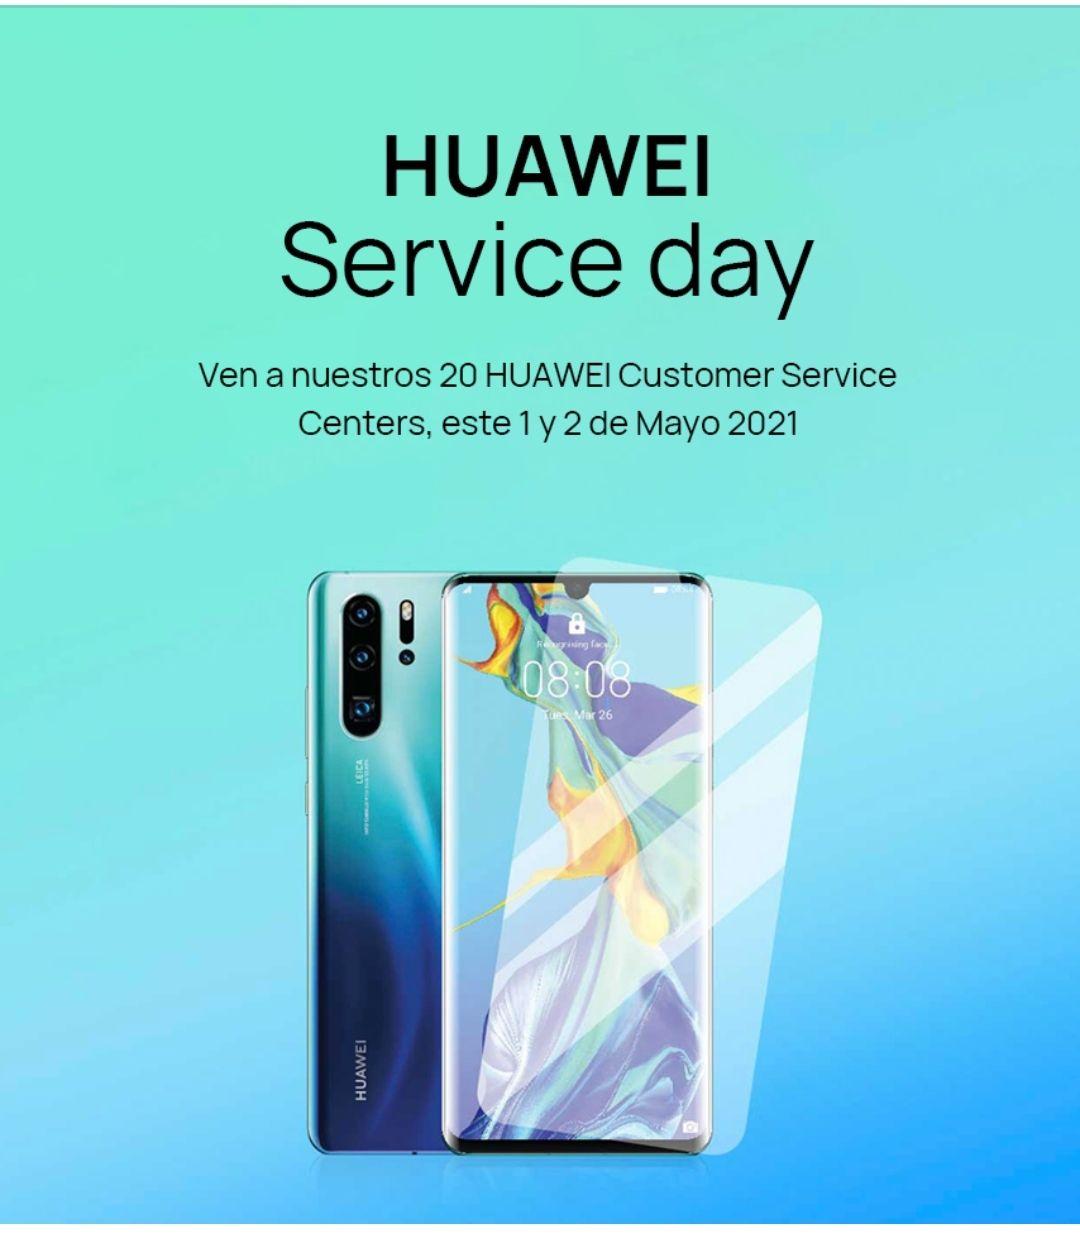 Huawei Service Day 1 y 2 de mayo